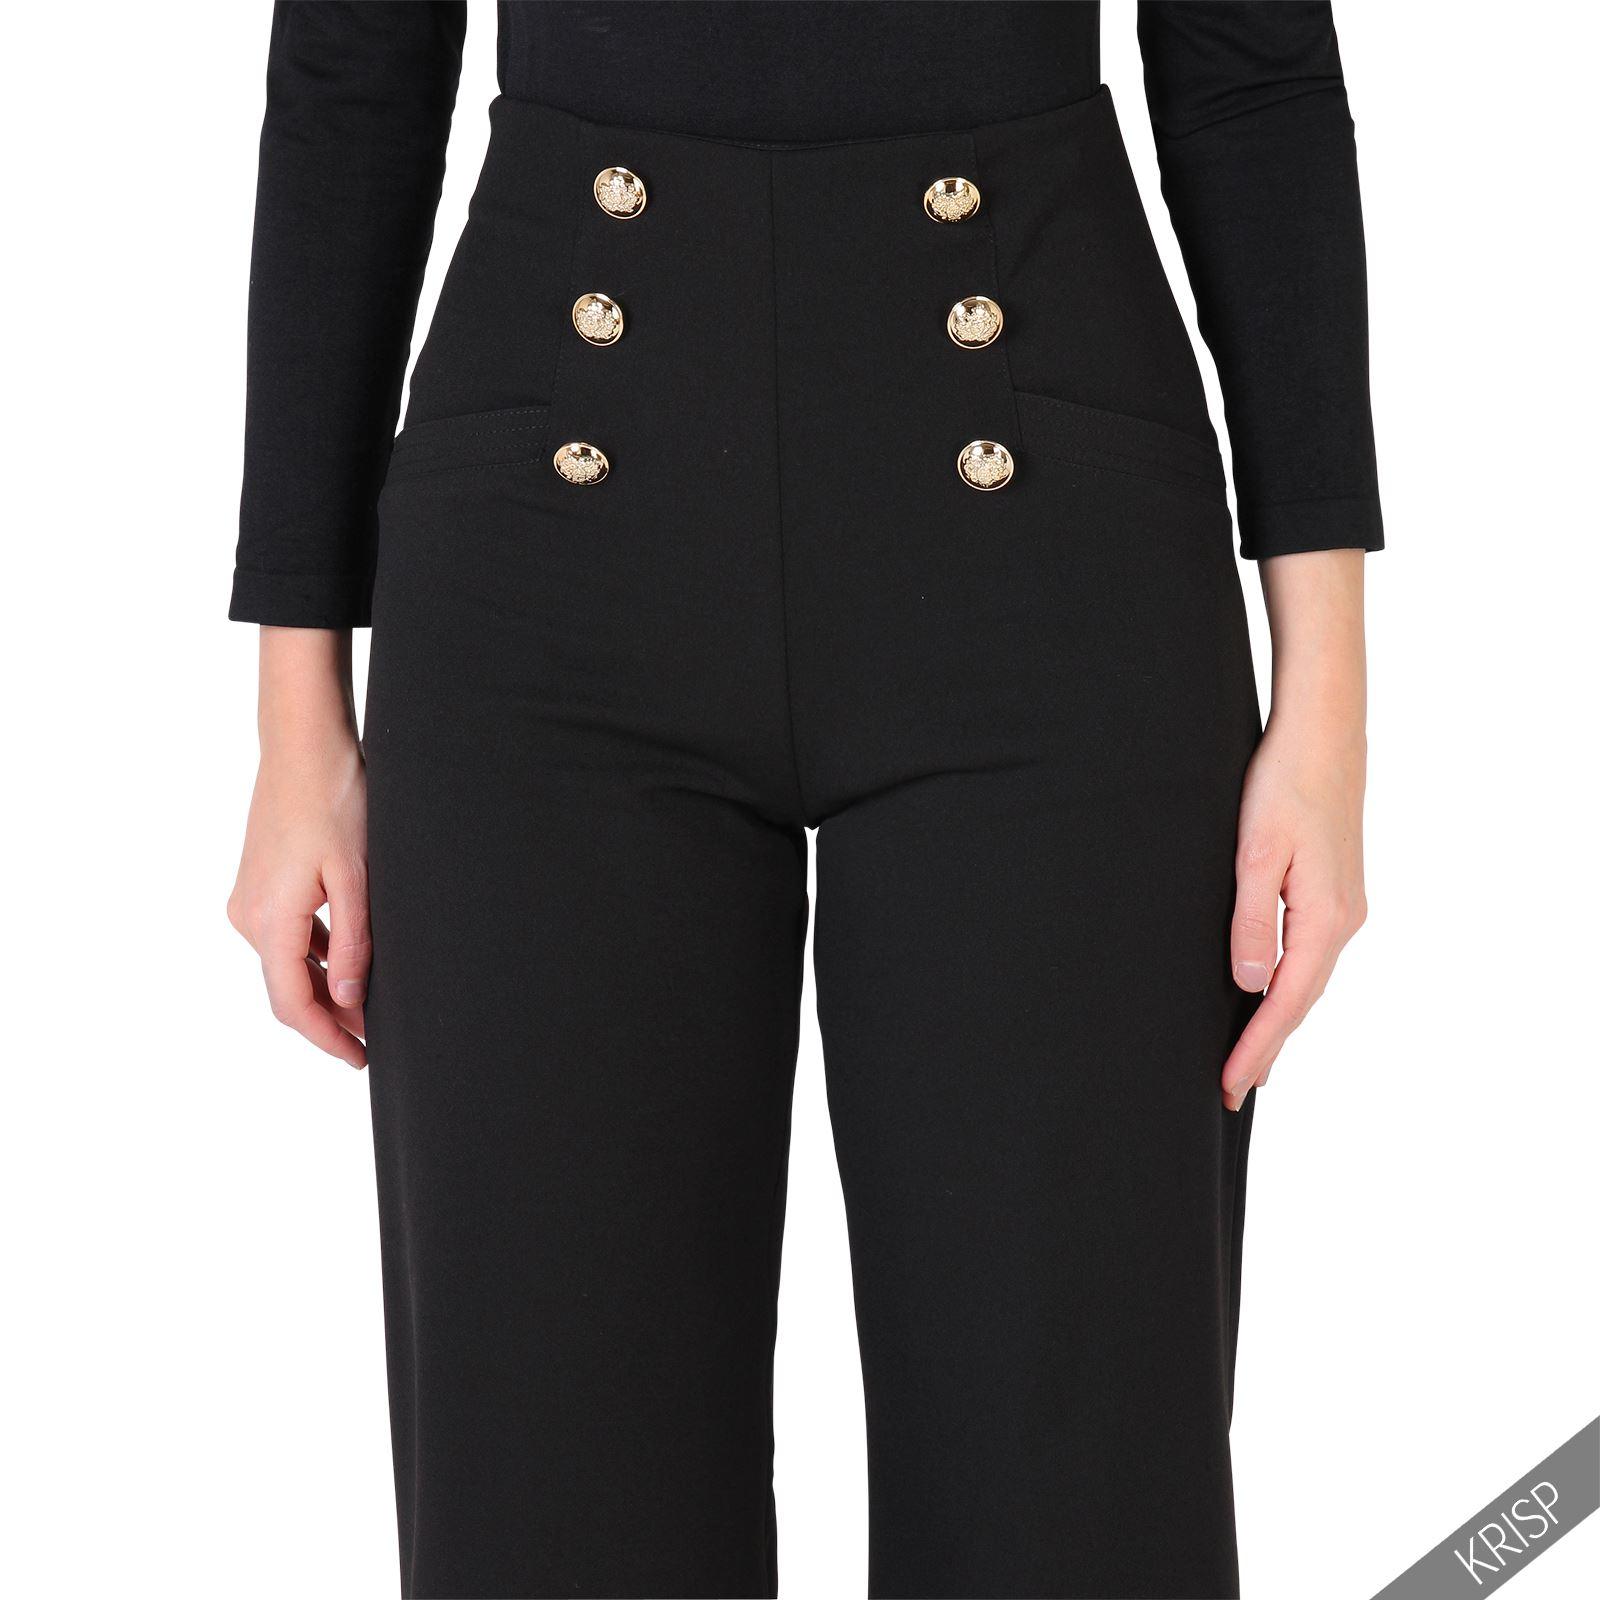 femme pantalon boutons dor s taille haute nautique jambes larges ebay. Black Bedroom Furniture Sets. Home Design Ideas